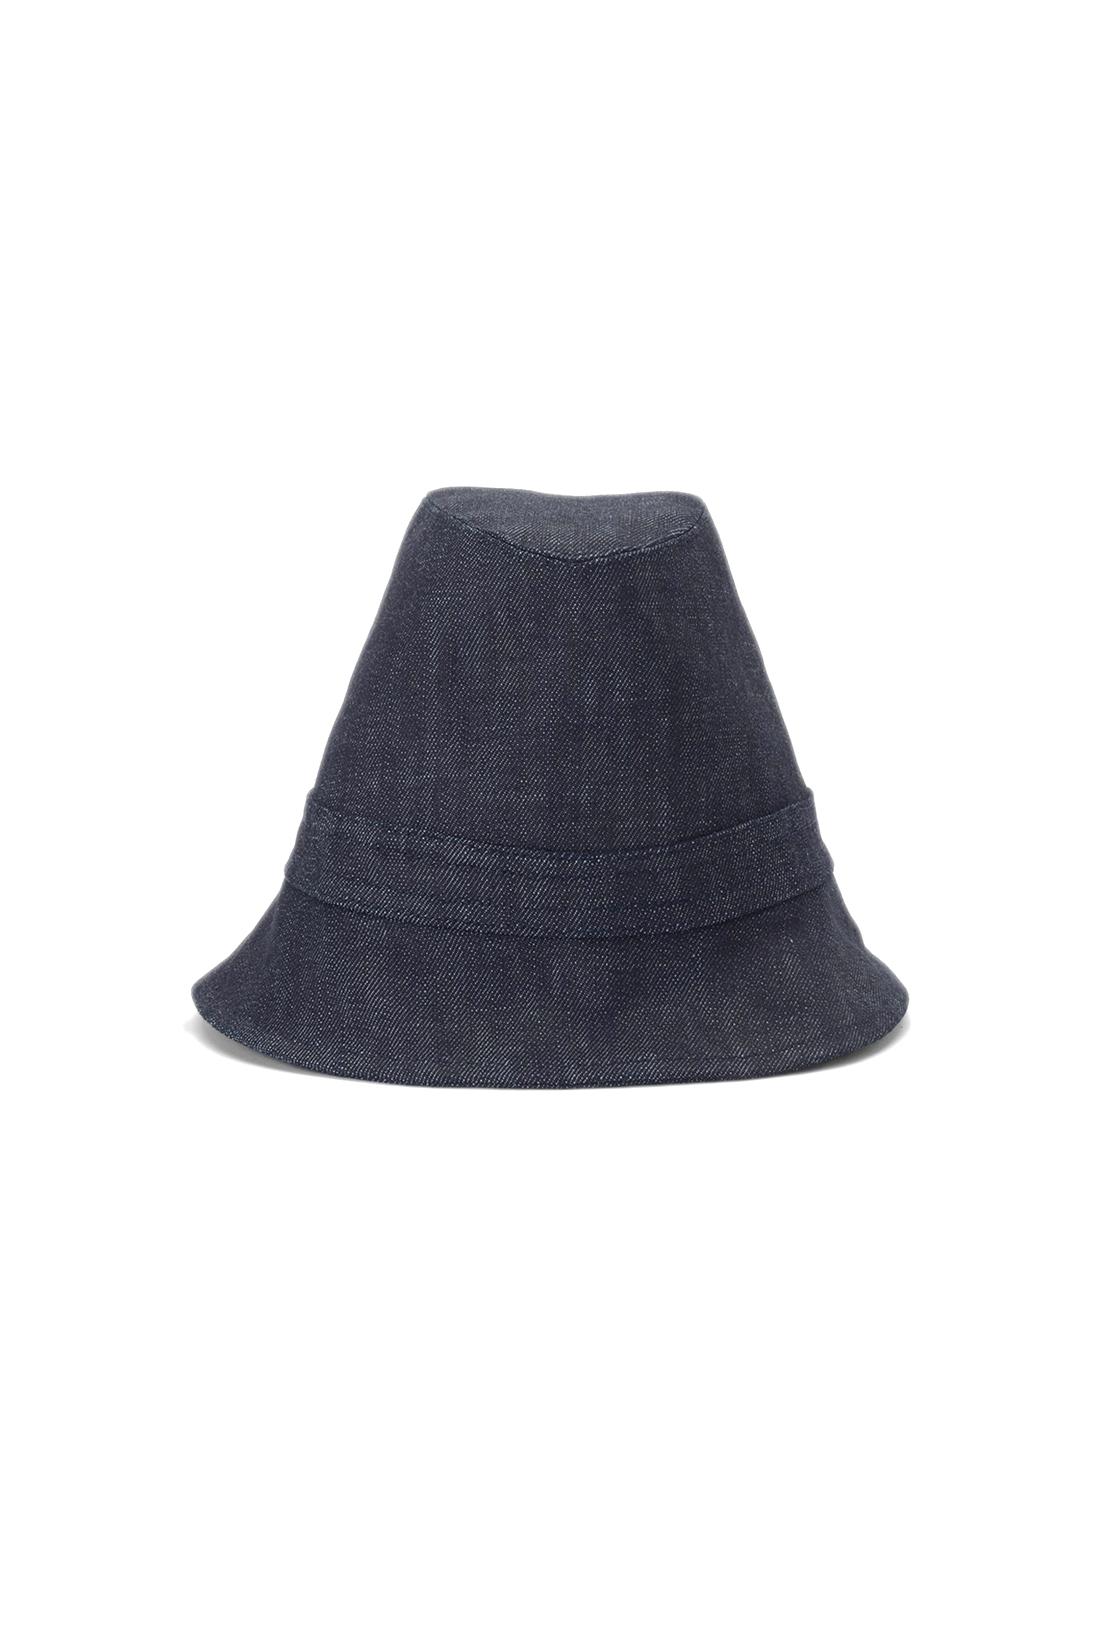 10-spring-denim-trends-hats-04.jpg